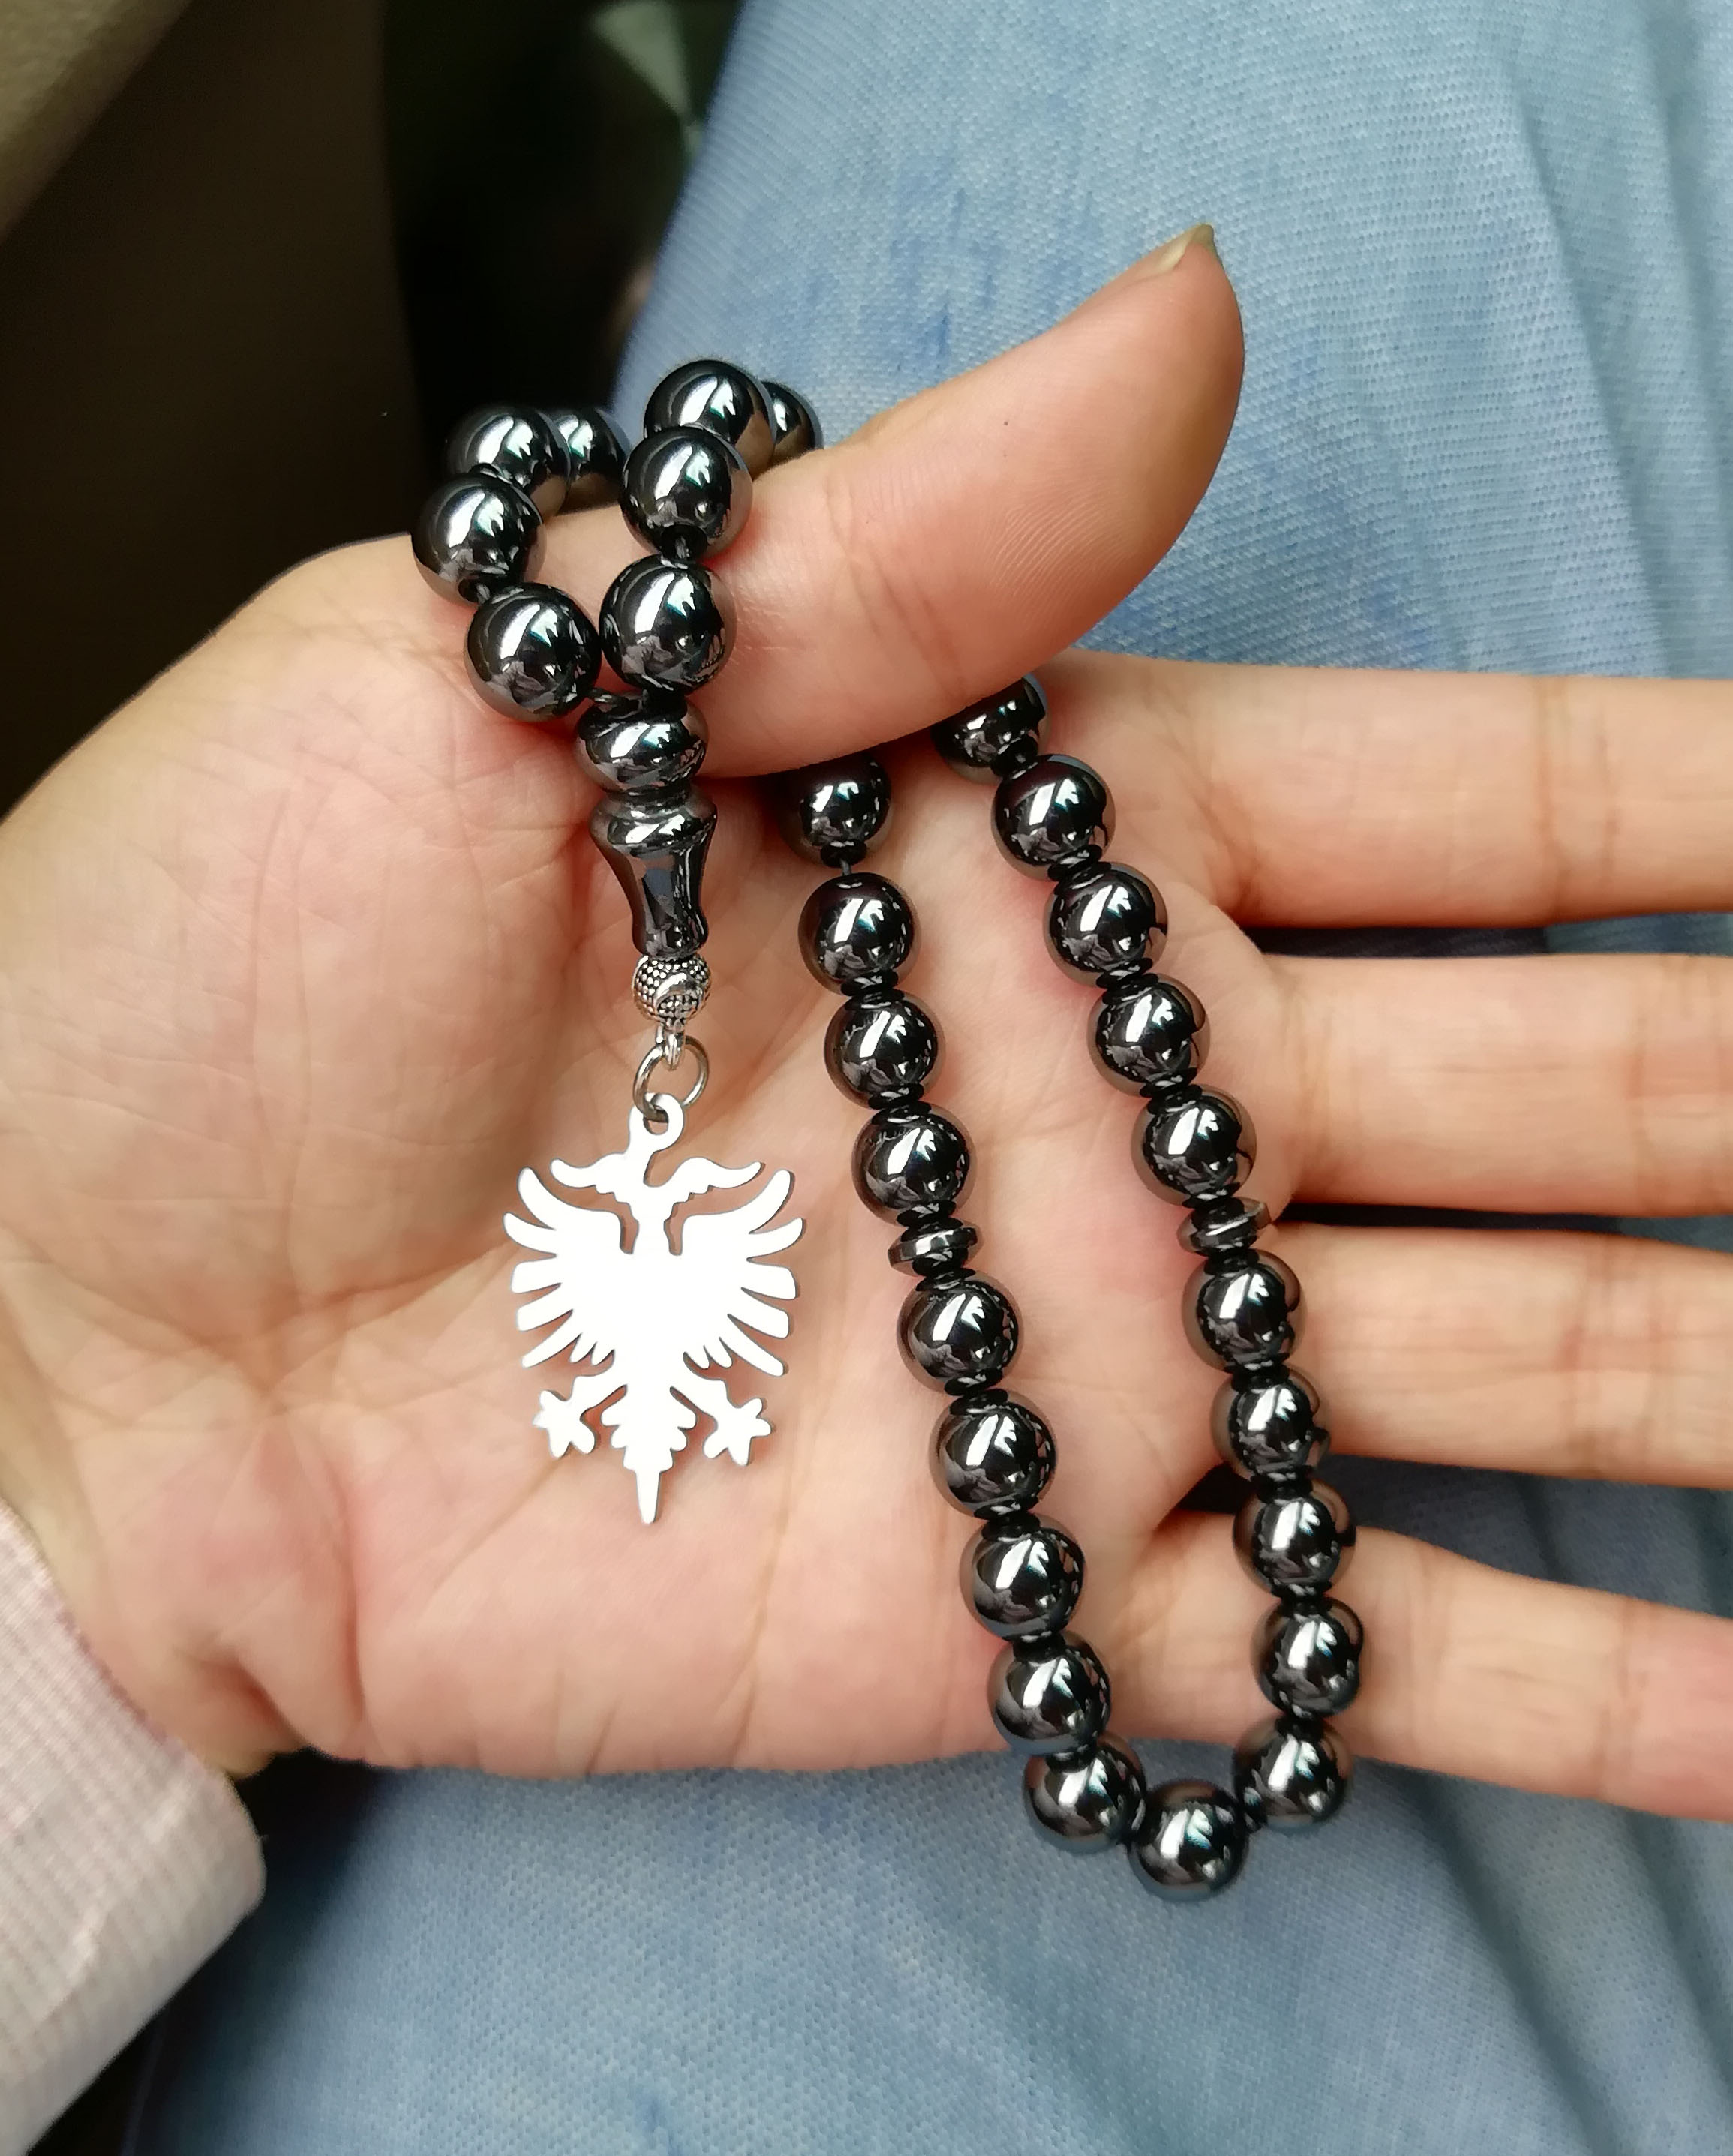 Collar con anillo de la bandera de Albania/kosovar de tasbih, mapa de Shqiperise, Rosario de cuentas de oración, regalo de tesbih, parches de pin para funda de teléfono Kosoves